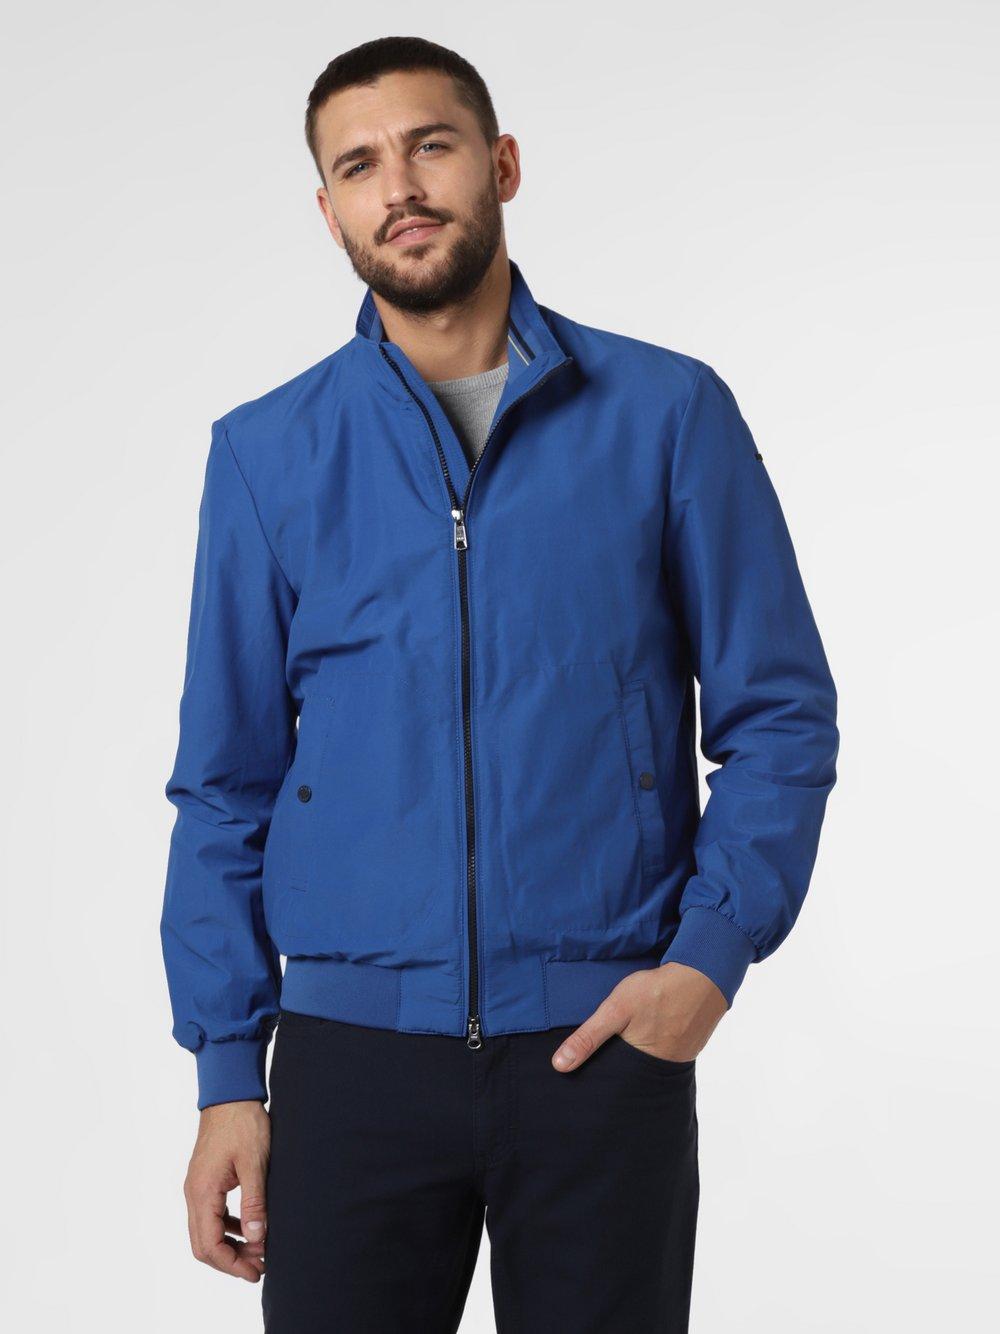 GEOX - Męska kurtka funkcyjna – Vincit, niebieski